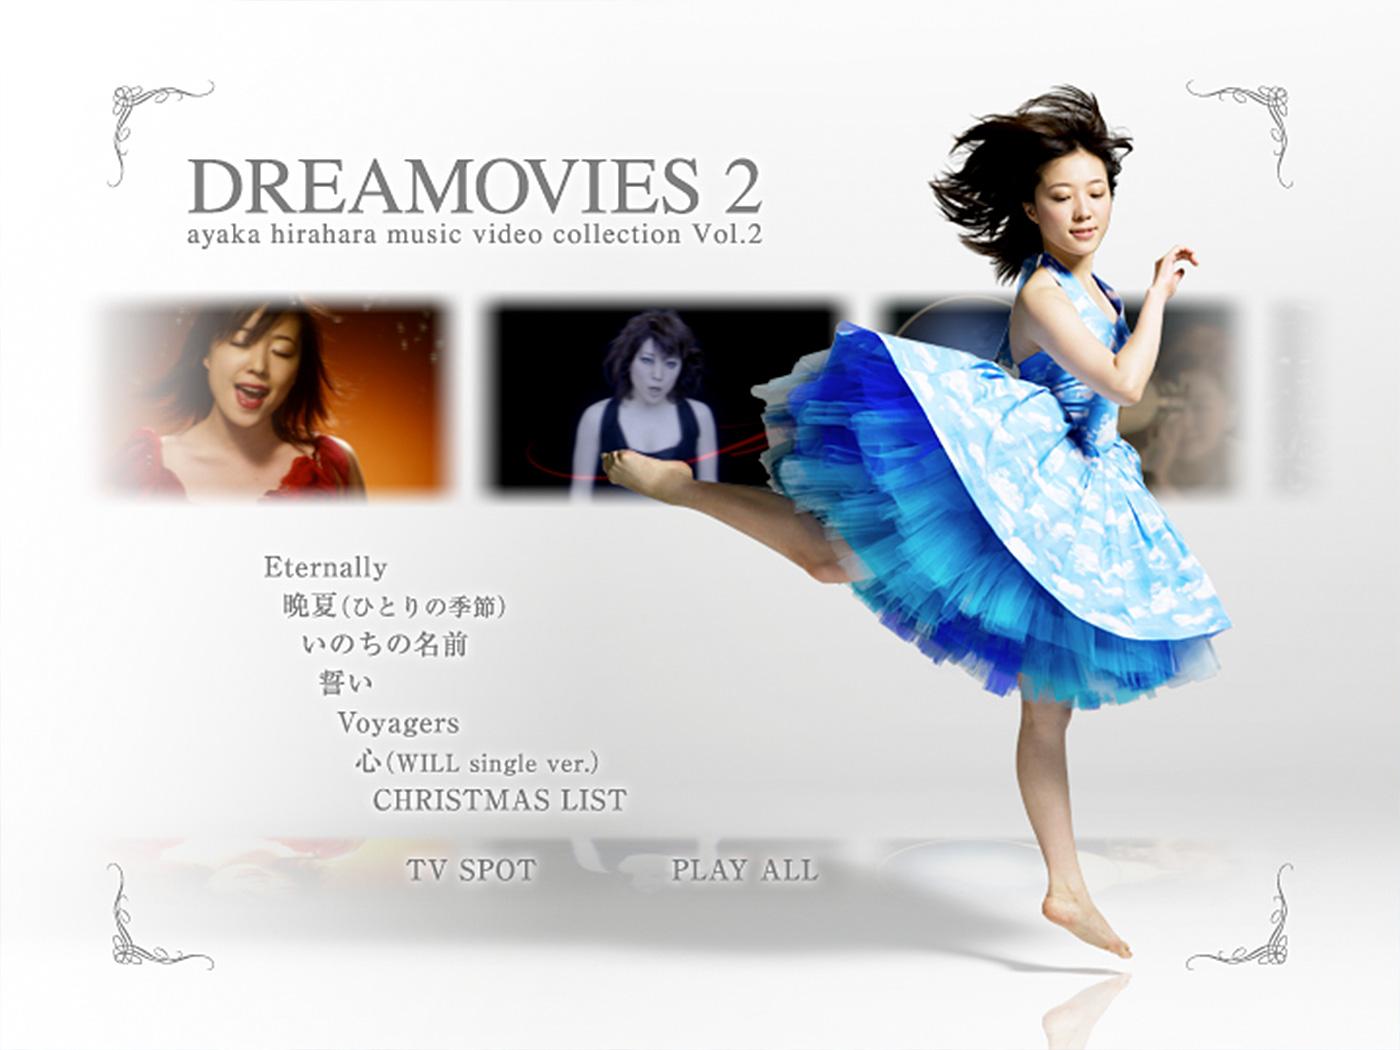 DREAMOVIES 2